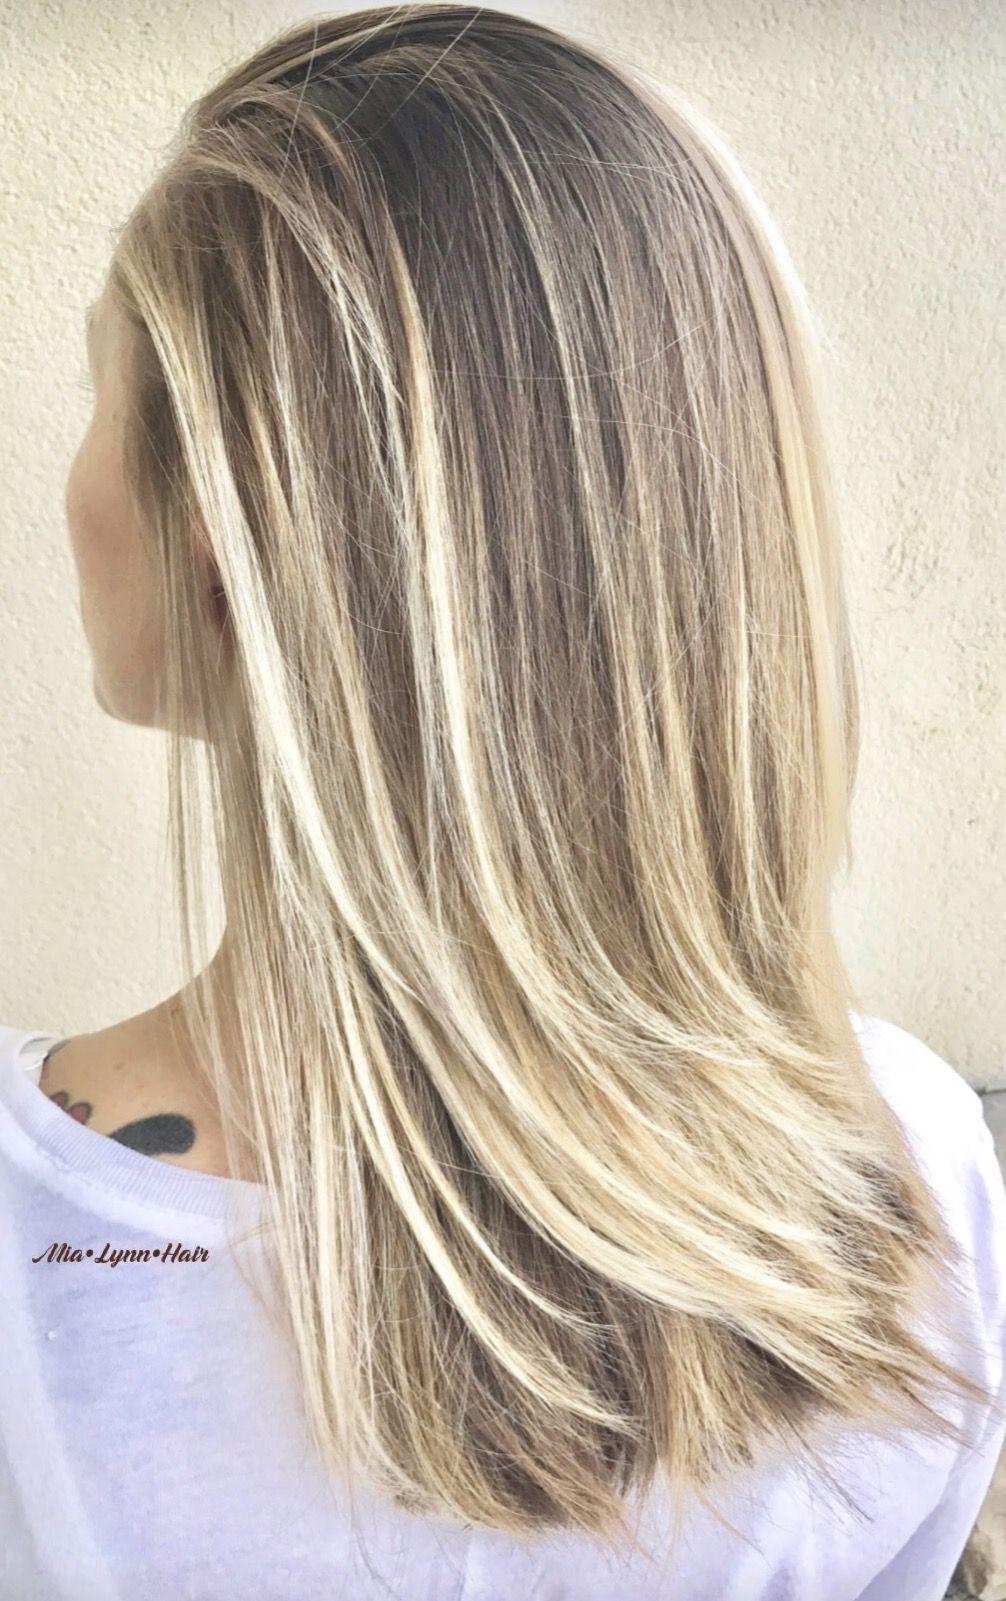 Blonde Blonde Hair Balayage Highlights Balayage Highlights